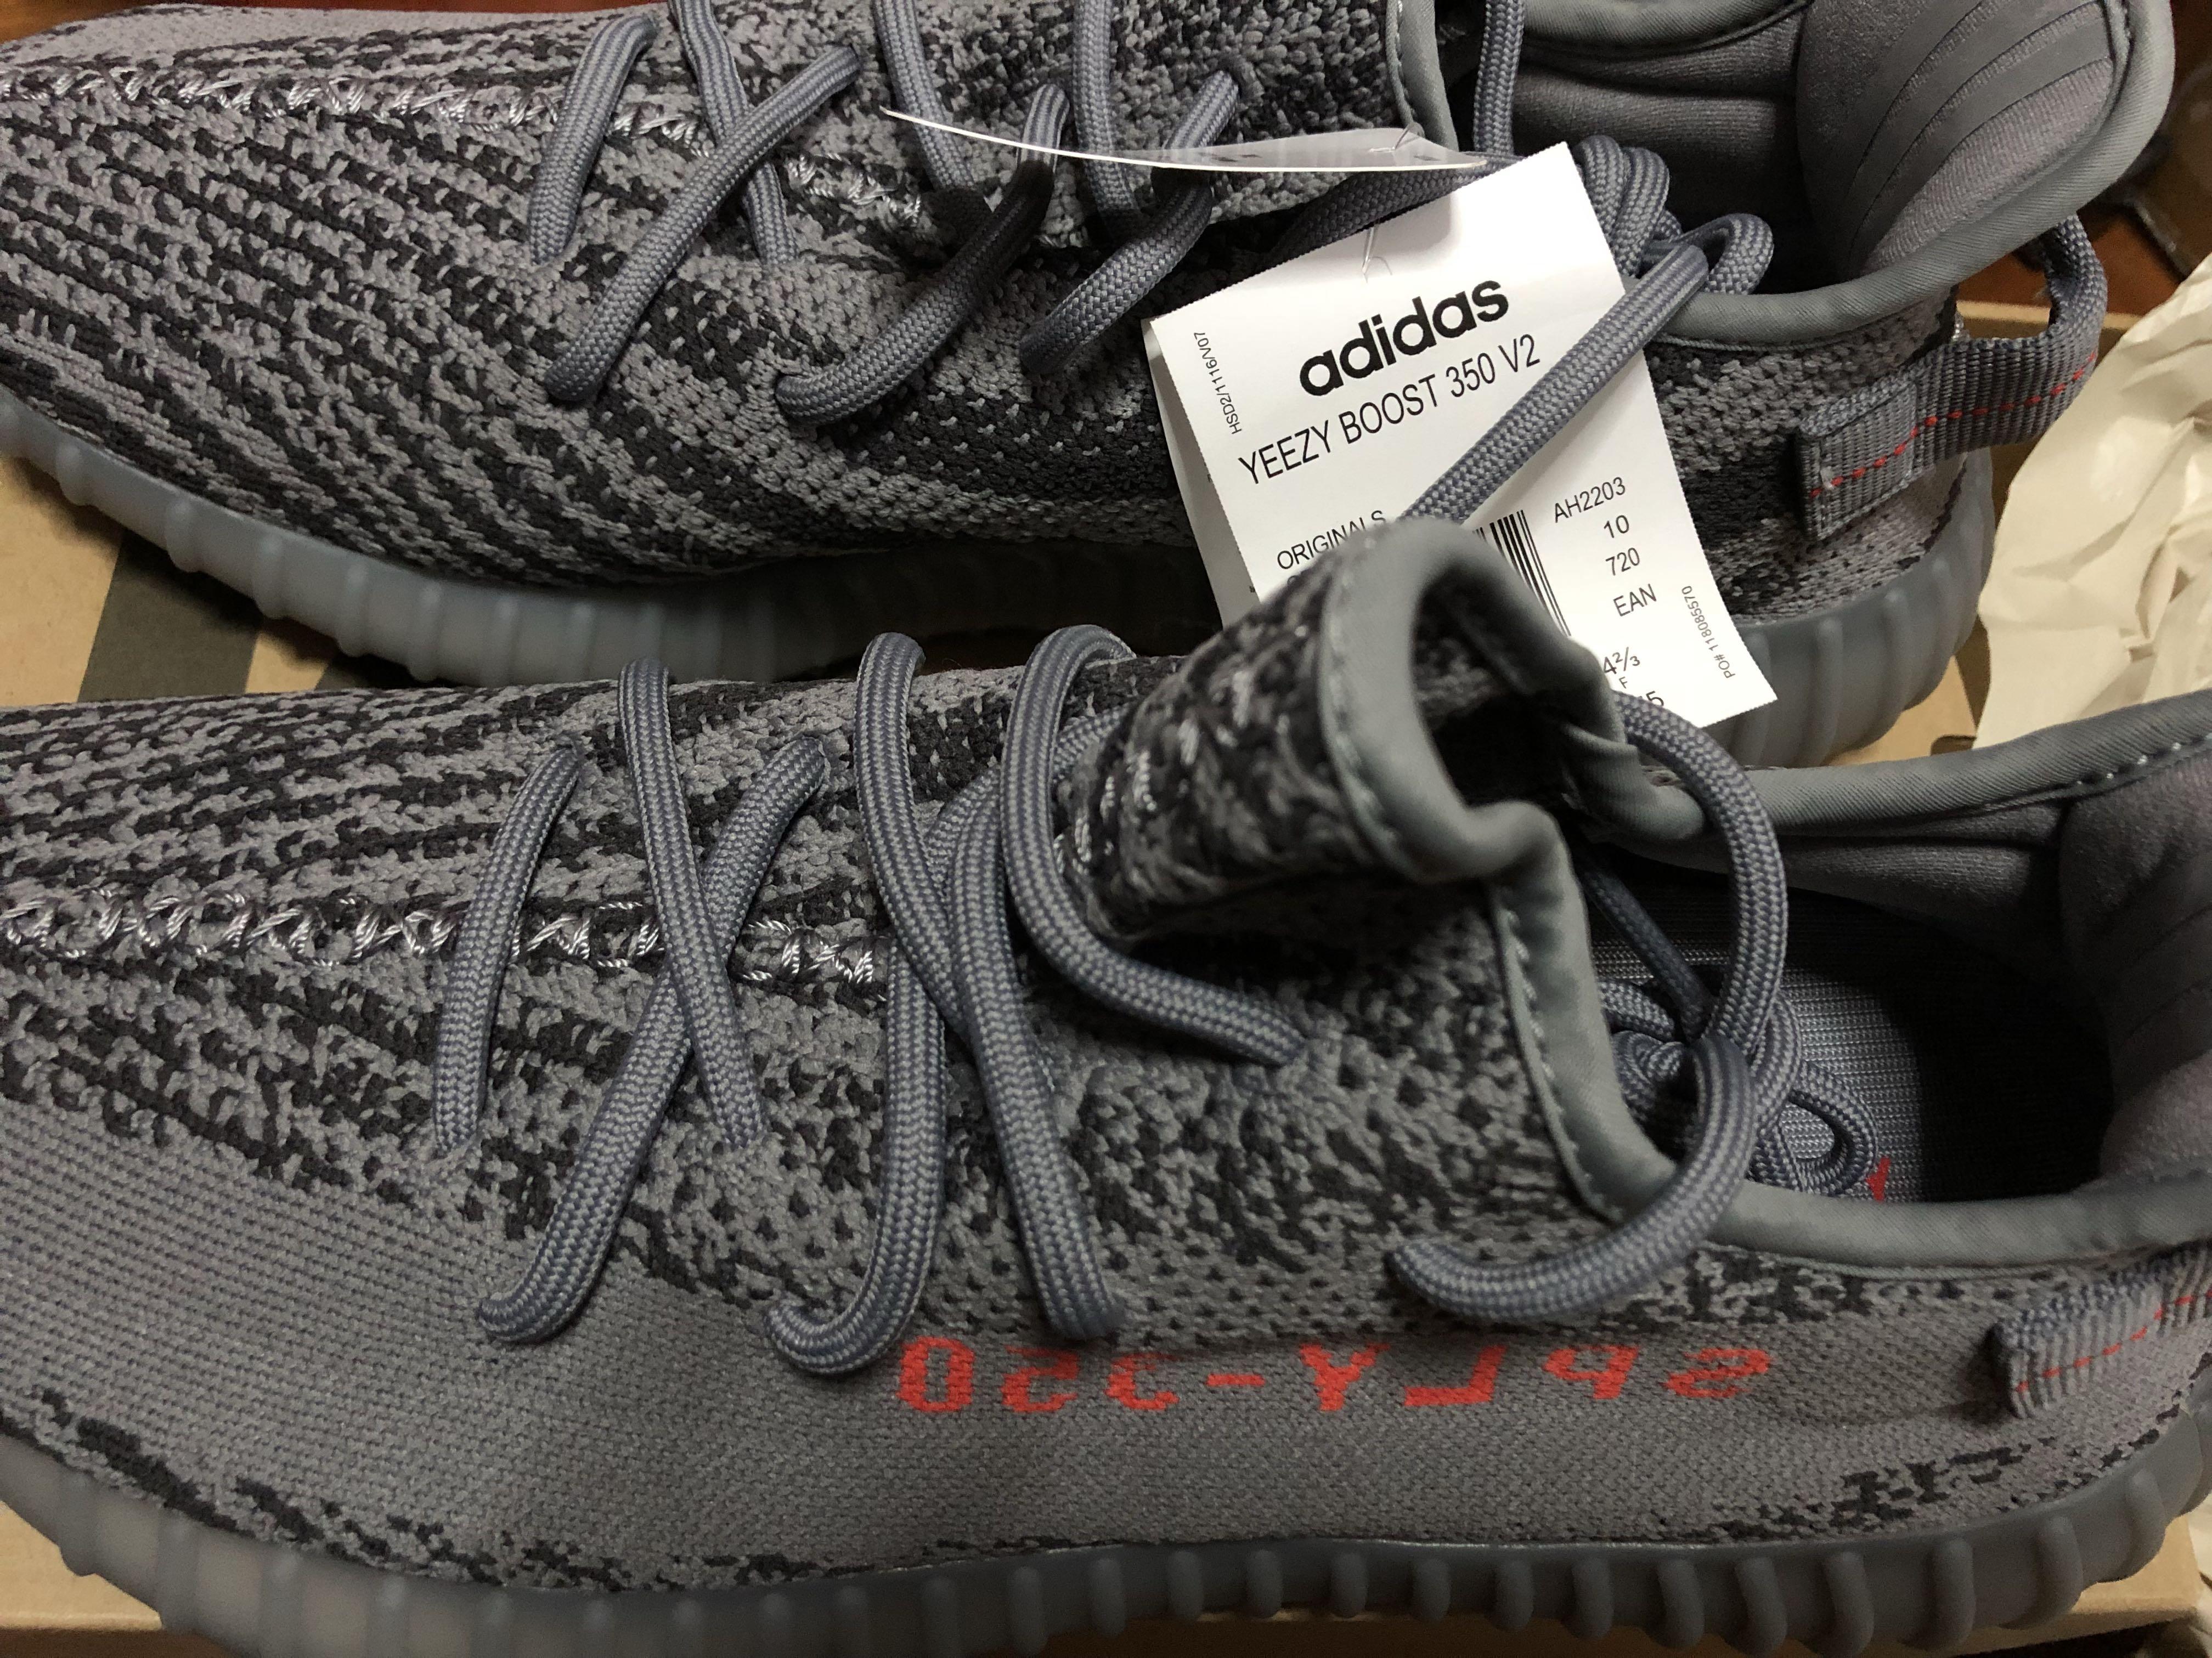 d2b99e9c1f5f Adidas Yeezy Boost 350 V2 Beluga 2.0